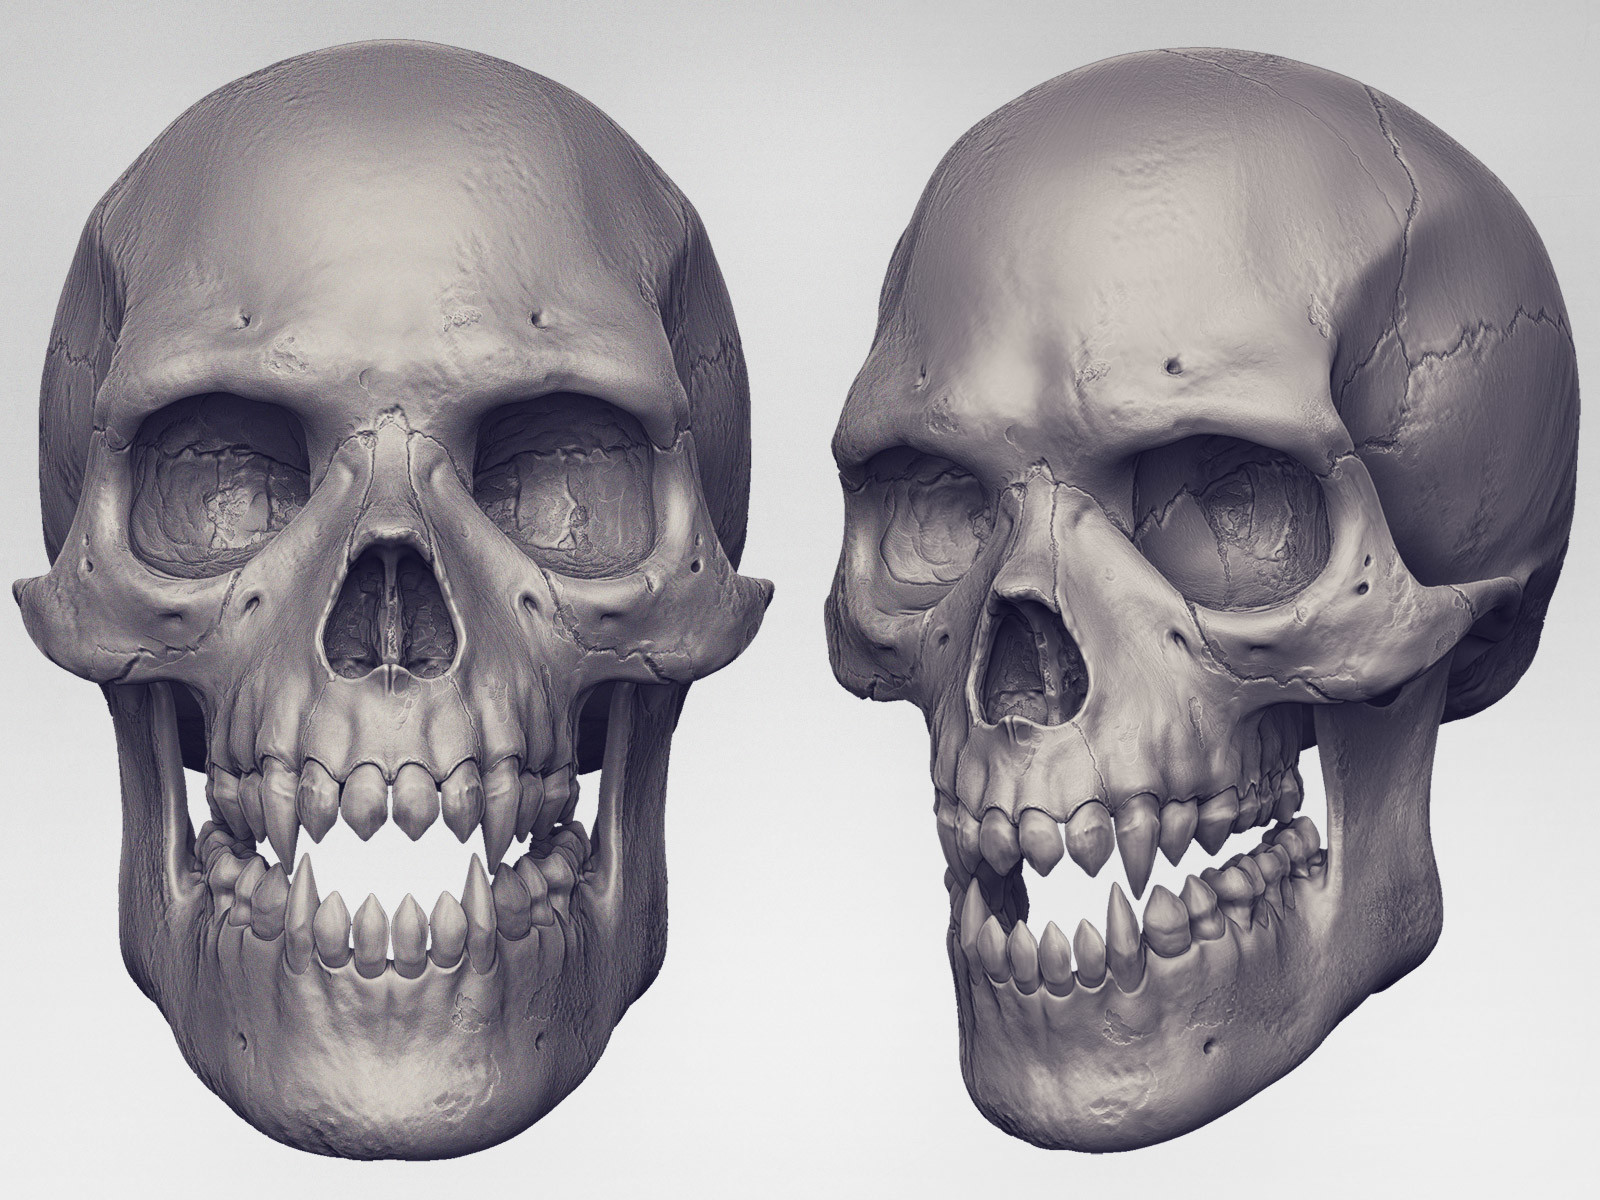 Mashru mishu skull r